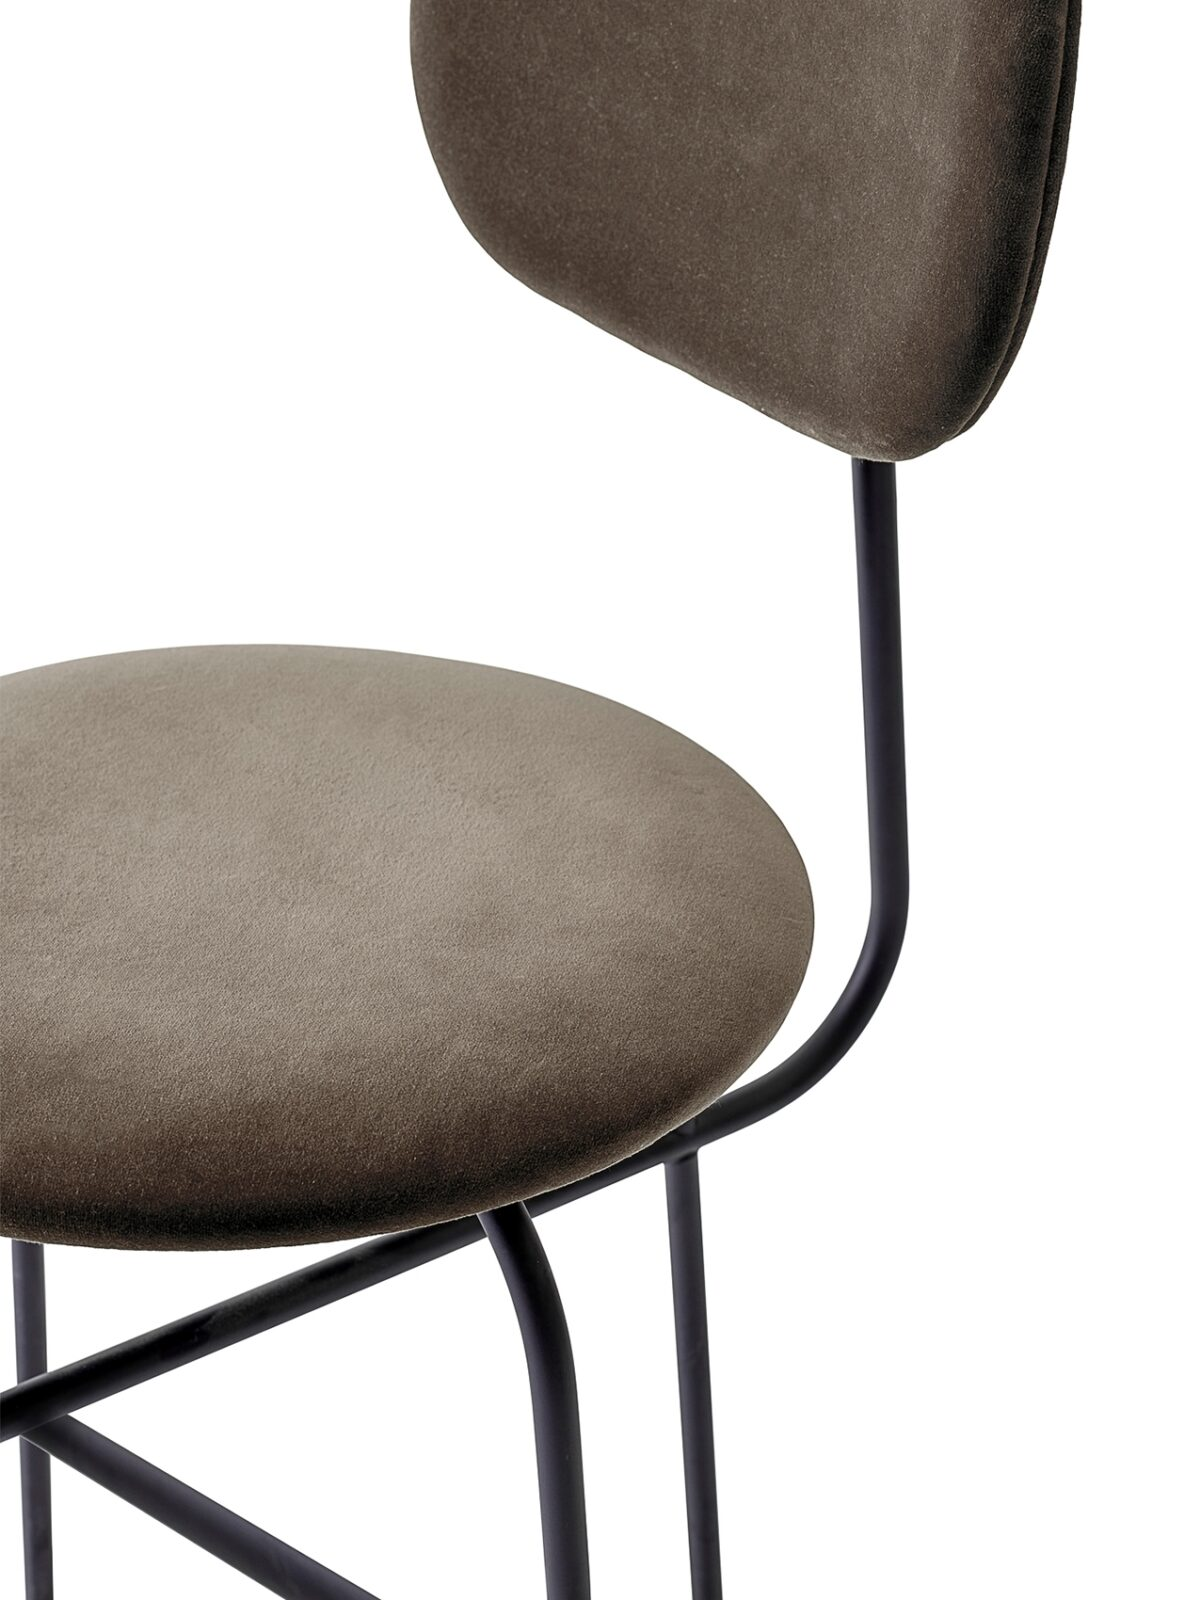 8465989 Afteroom Dining Chair Plus CityVelvetCA7832 078 Black CloseUp